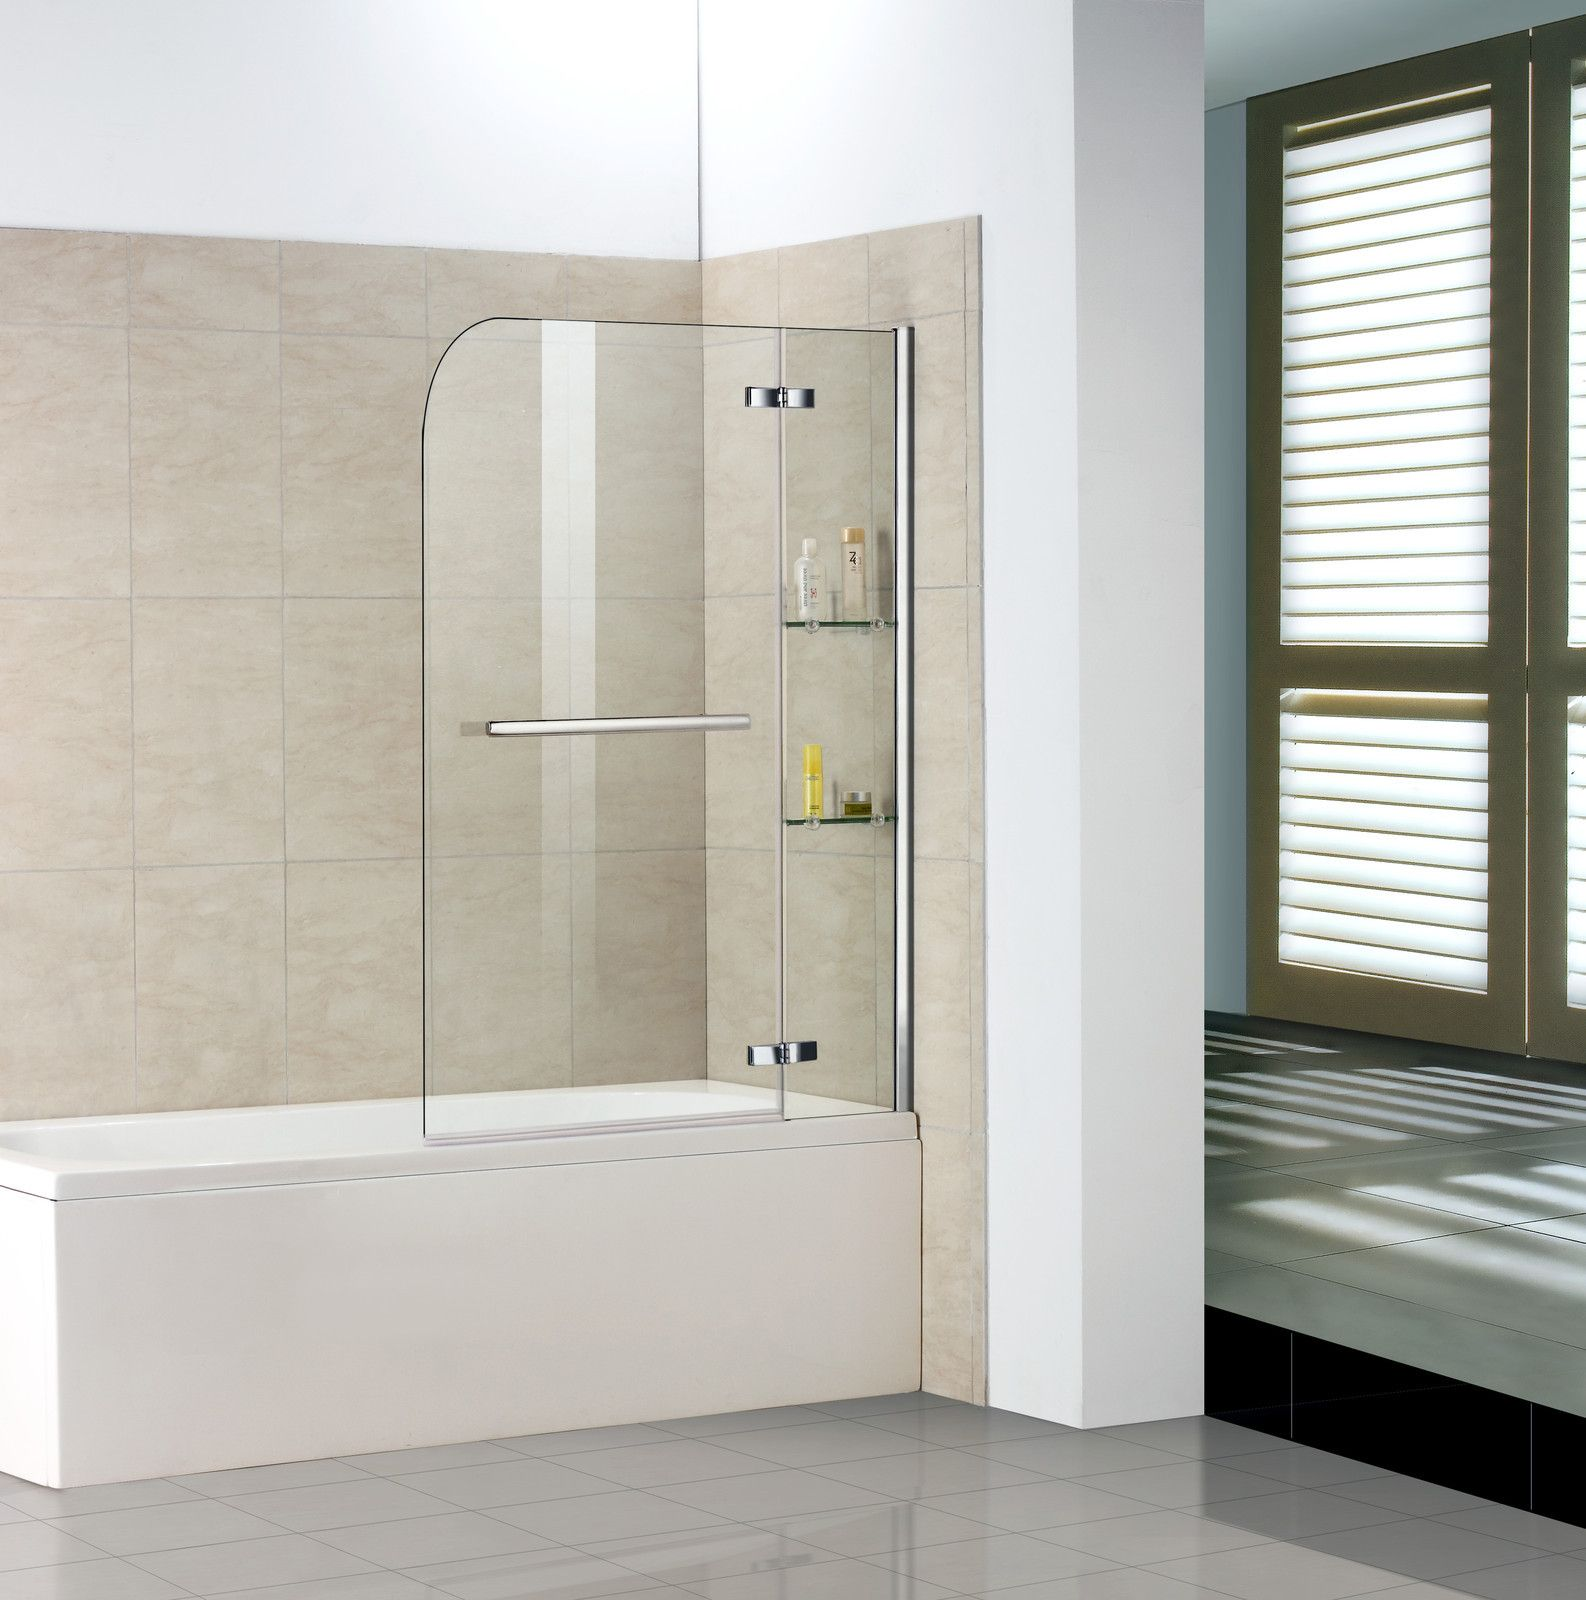 Badewanne 2 tlg faltwand duschwand drehen 90 duschabtrennung 90x140cm bad - Duschwand selber bauen ...